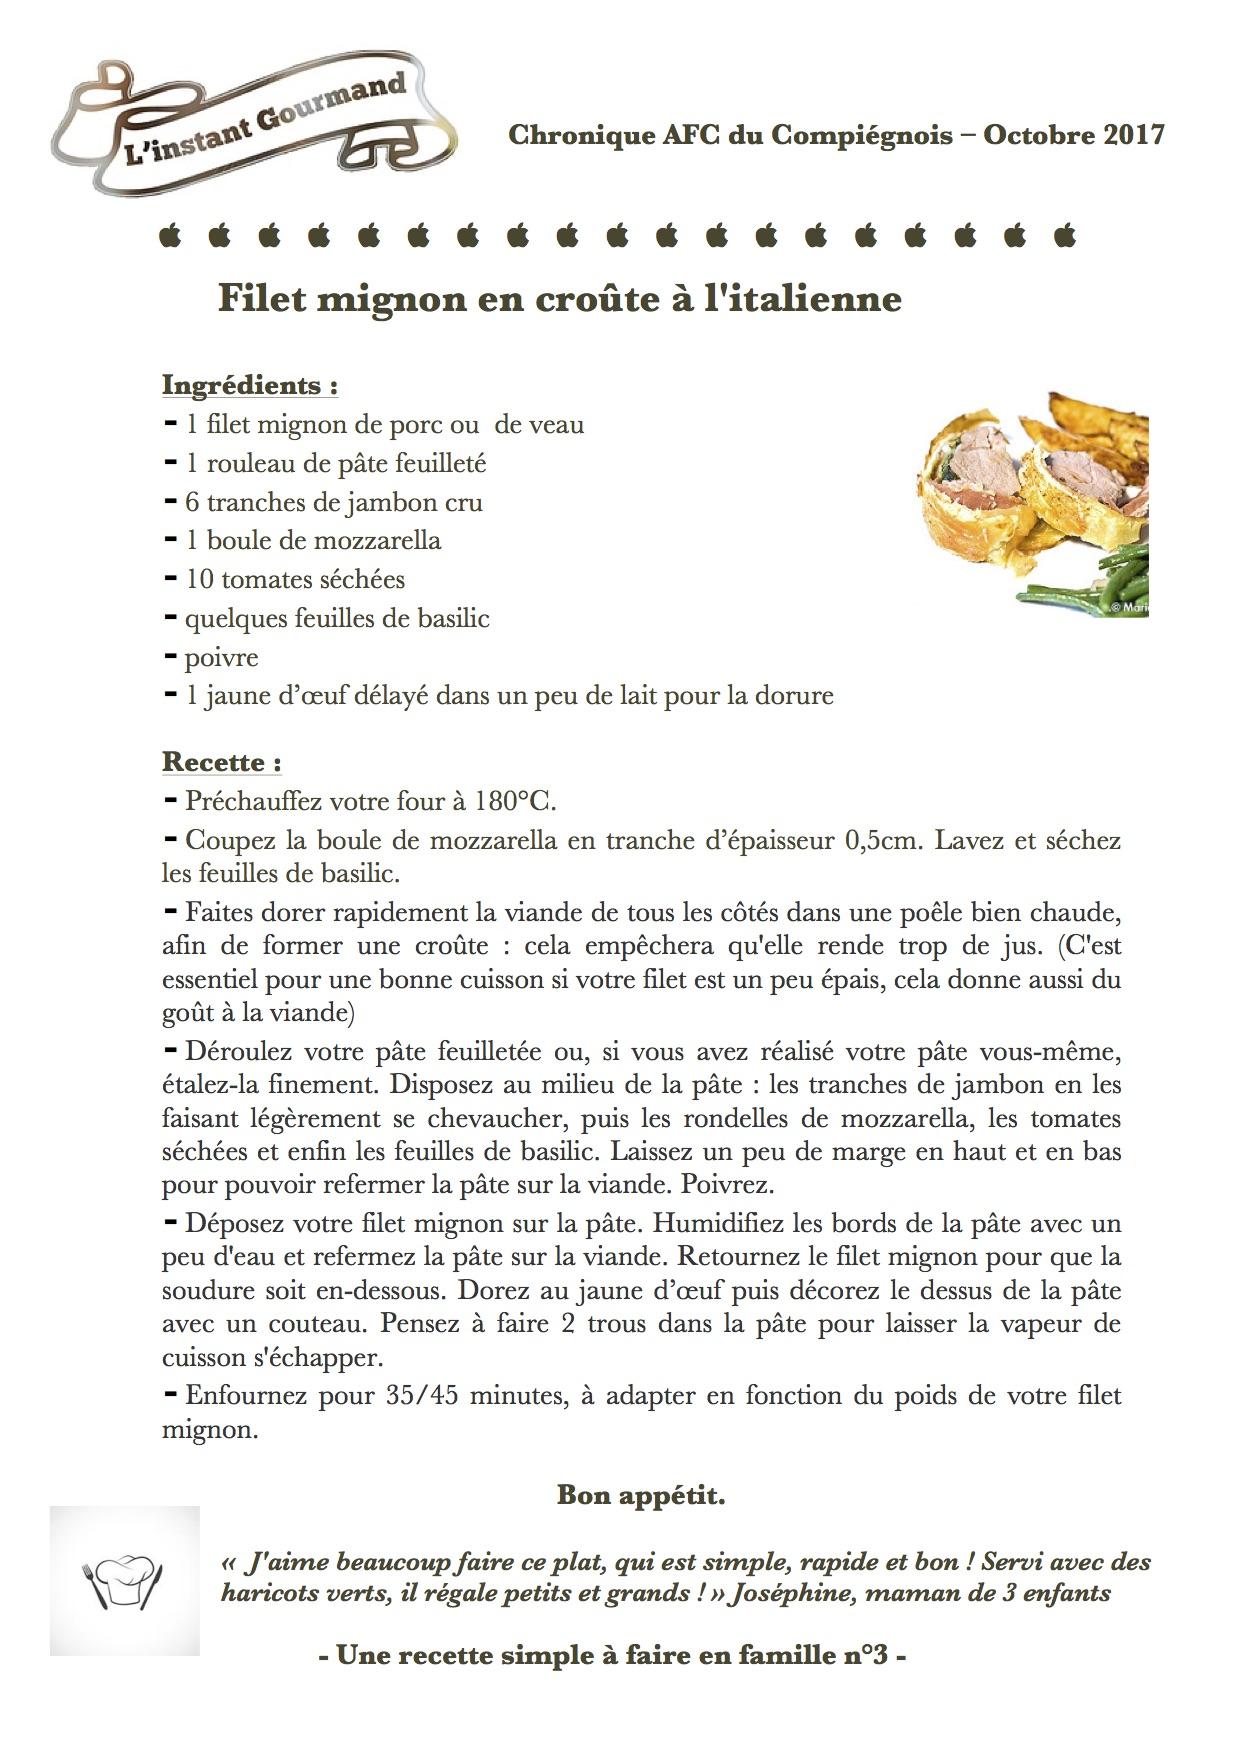 Chronique L'instant gourmand Octobre 2017